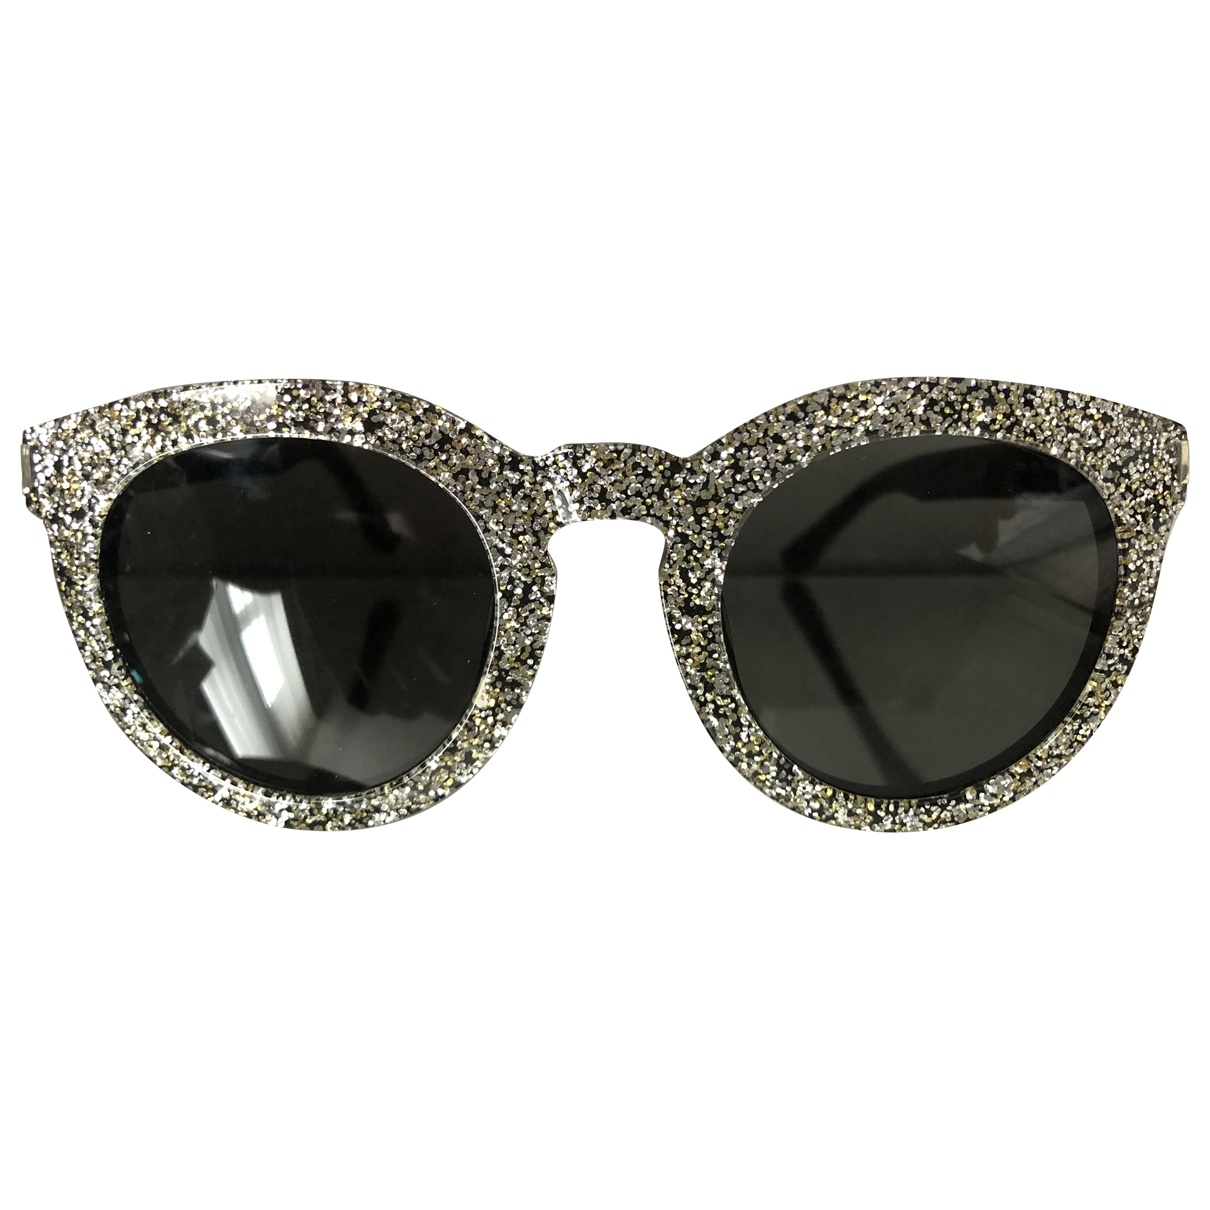 Saint Laurent \N Silver Sunglasses for Women \N